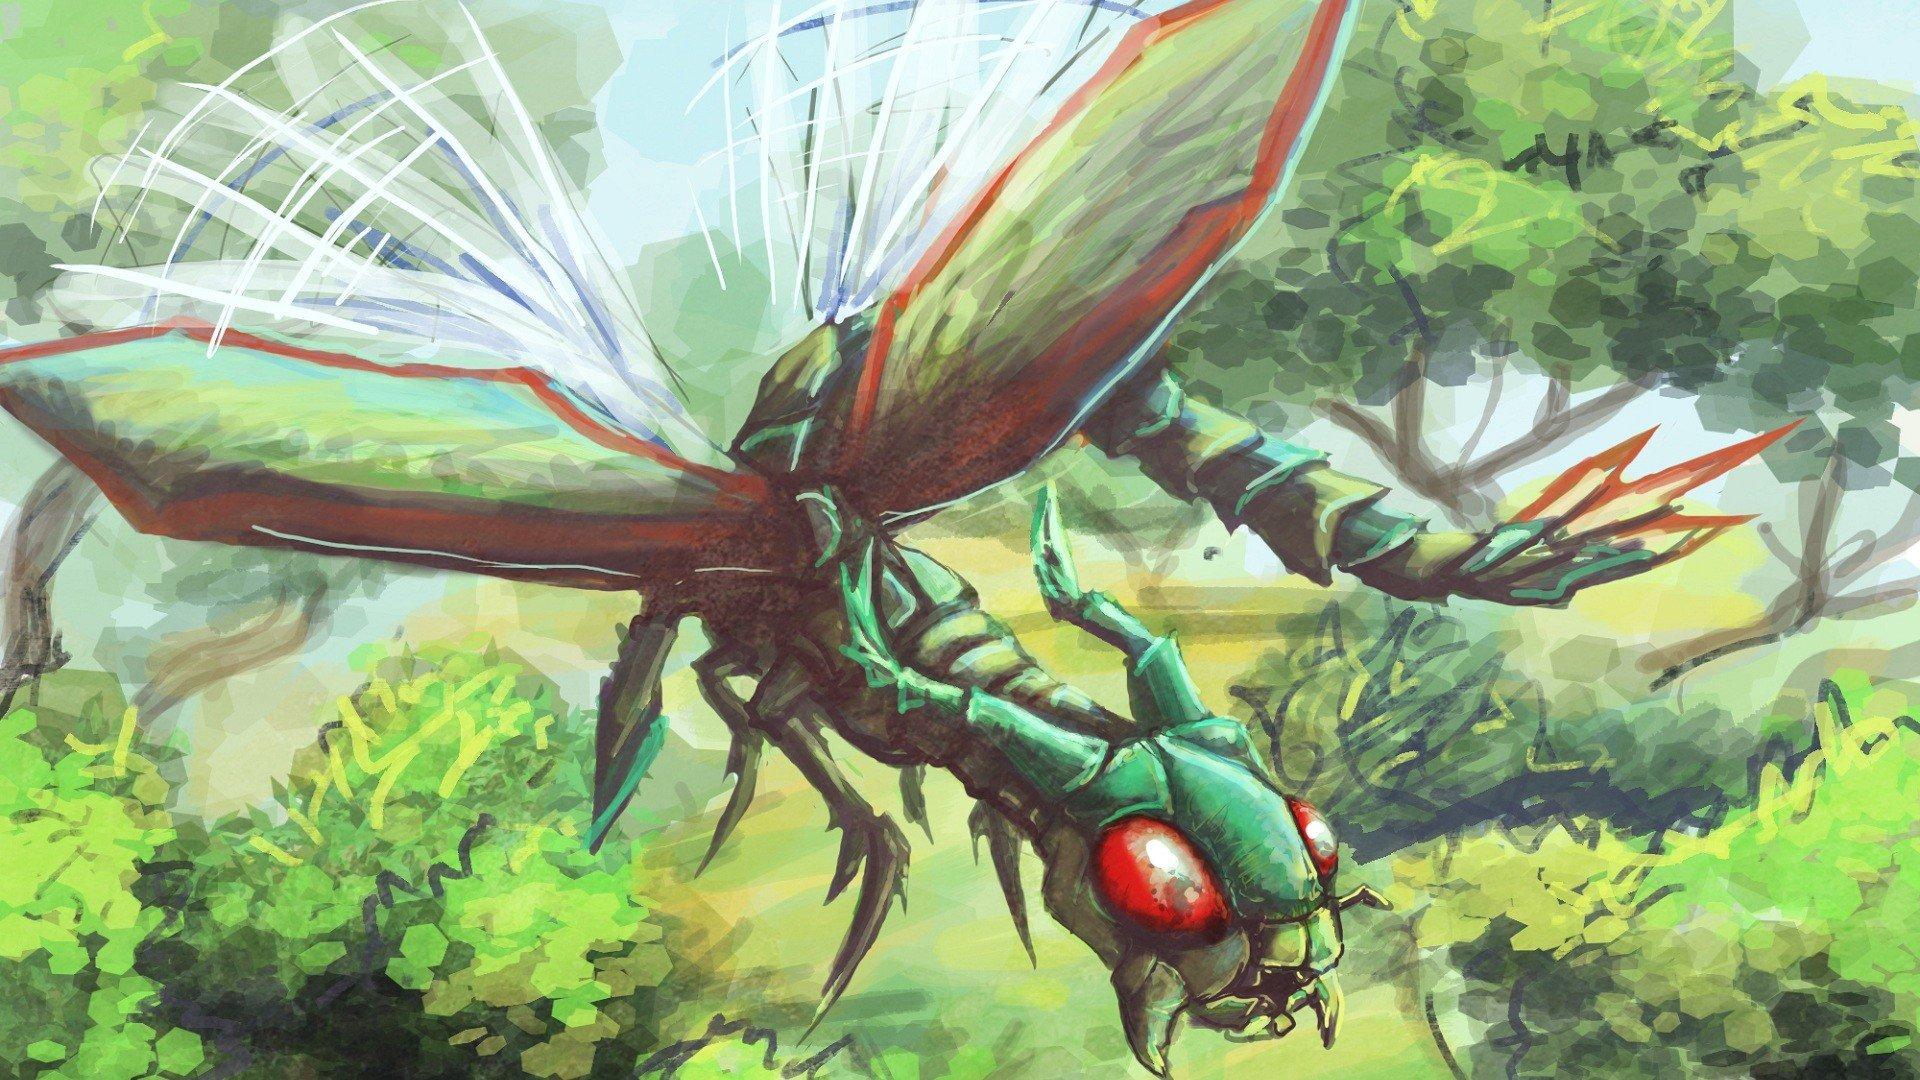 Best Flygon Pokemon wallpaper ID280742 for High Resolution full 1920x1080